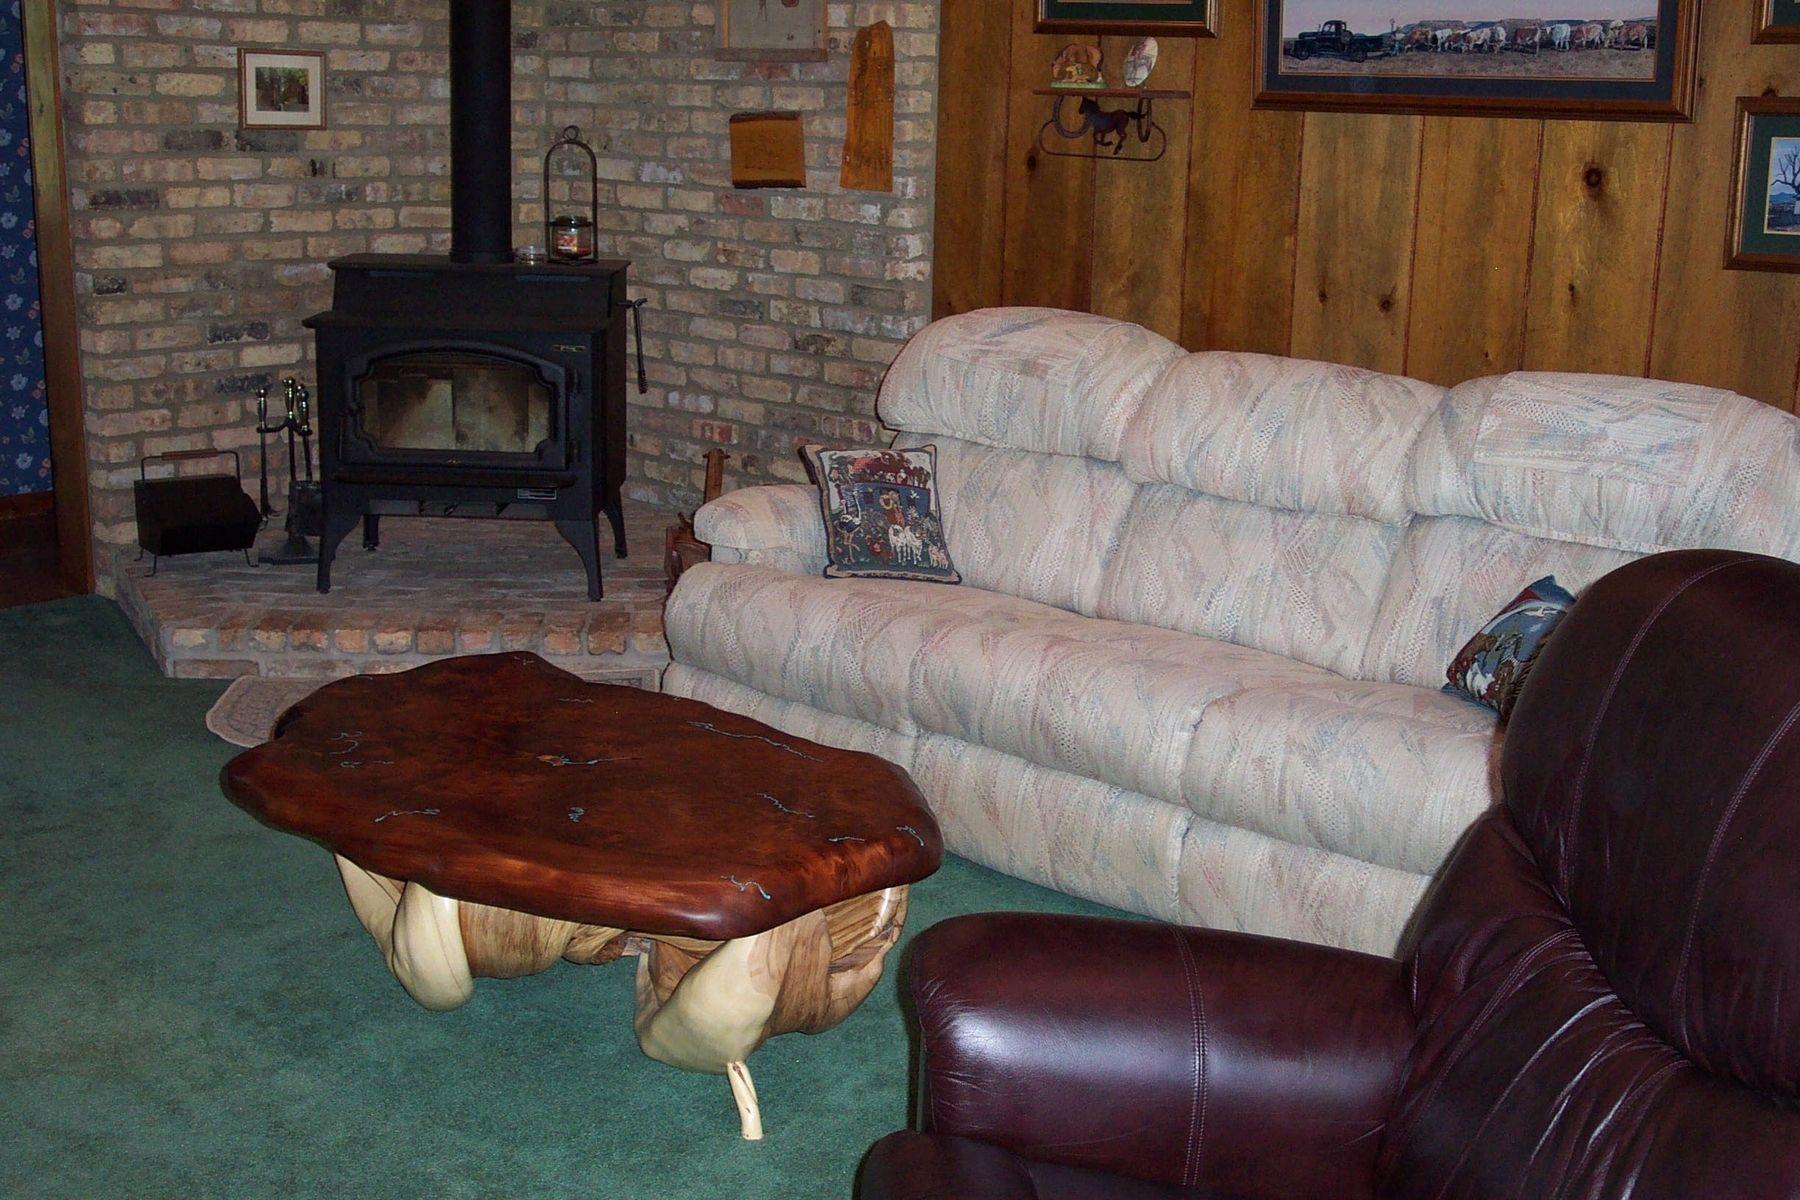 Custom redwood slab coffee table turquoise stone inlay twisted custom made redwood slab coffee table turquoise stone inlay twisted juniper base geotapseo Images